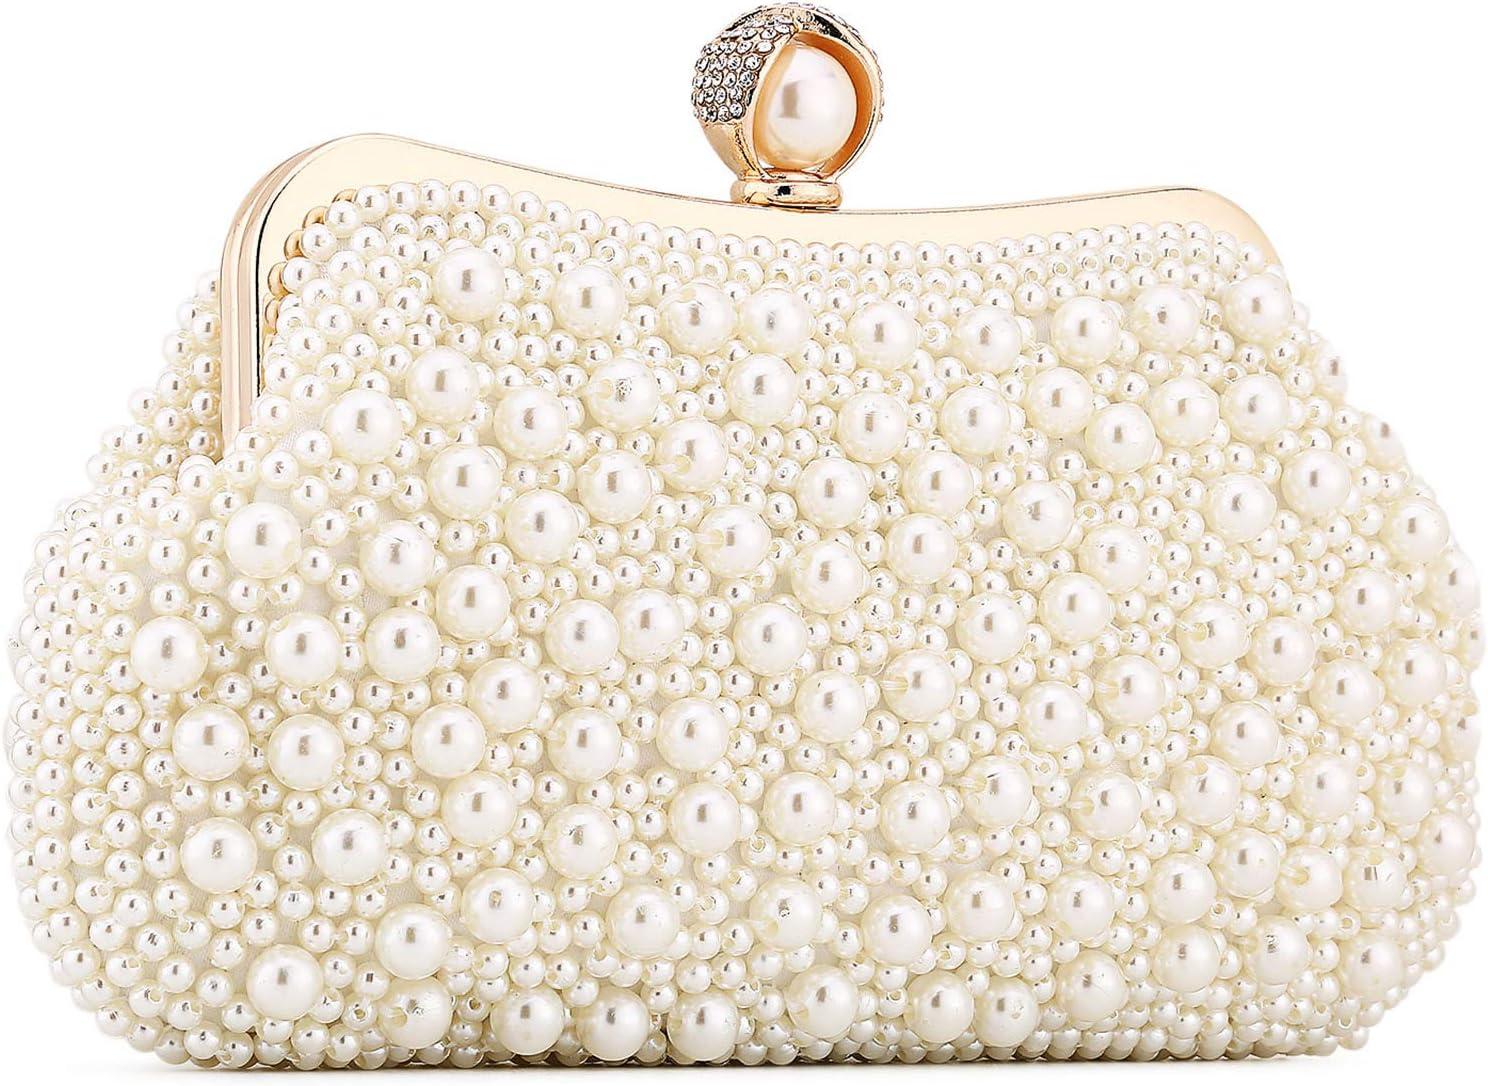 Evening Max 45% OFF Clutch Purse Wedding Finally popular brand Beaded Hand Bag Pearl Bridal